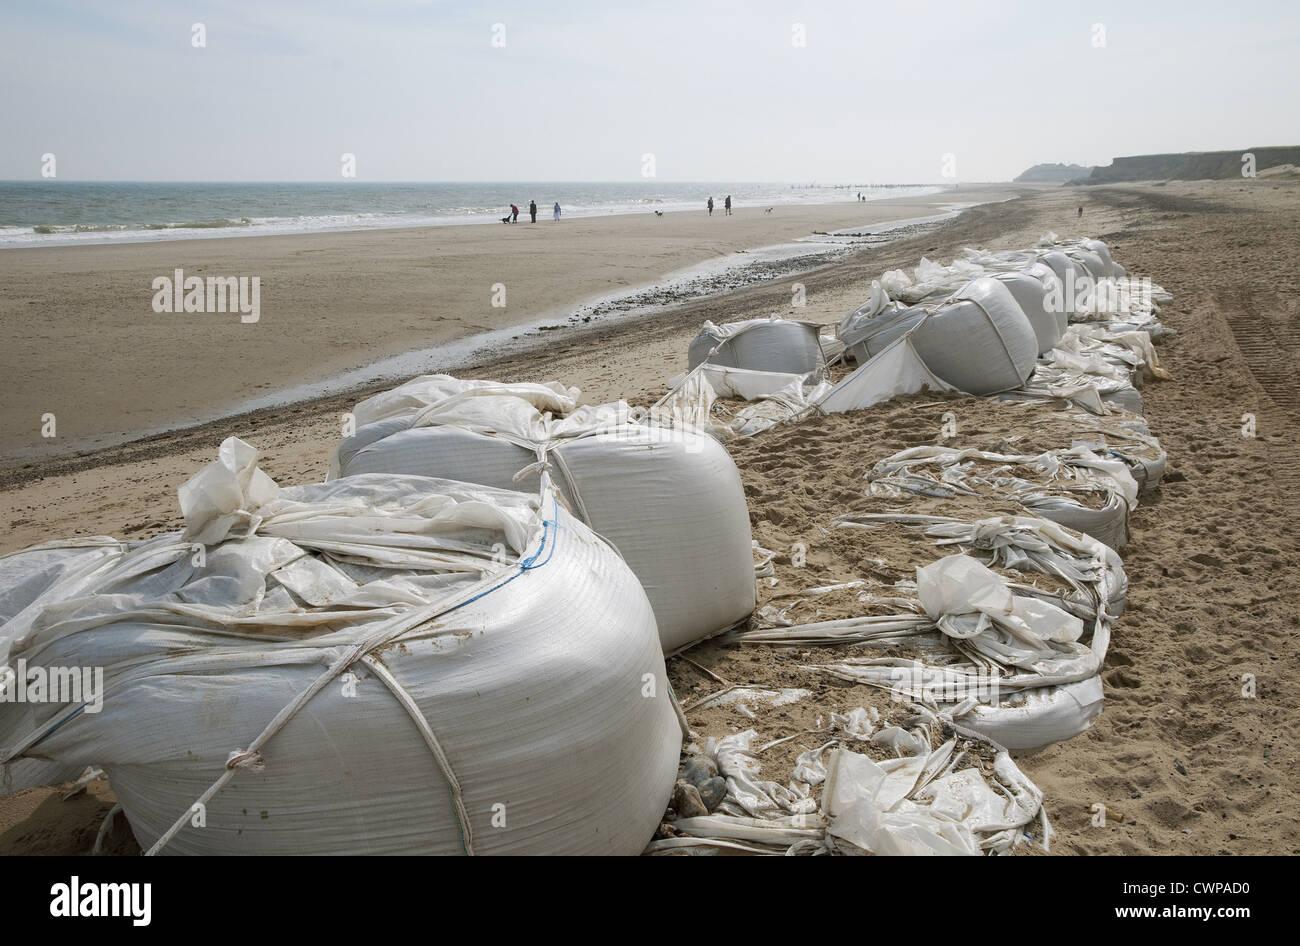 Failed geotextile tube (geotube) sea defences on beach, Happisburgh, Norfolk, England, august Stock Photo